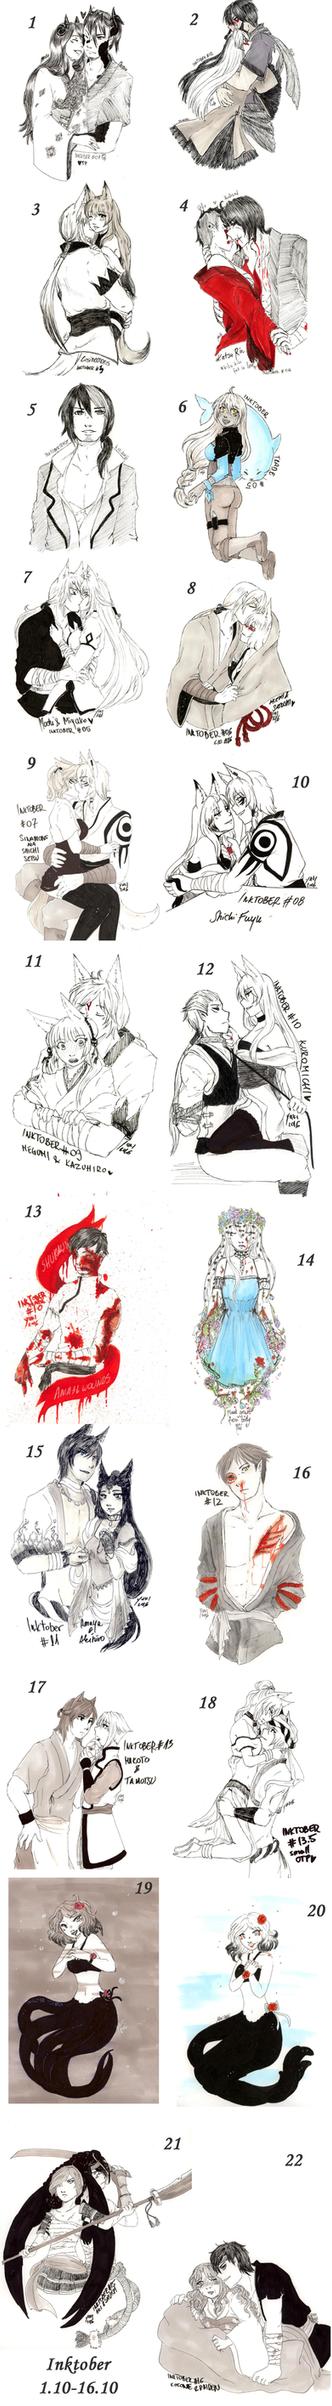 Inktober 1-16 by yukifubuki